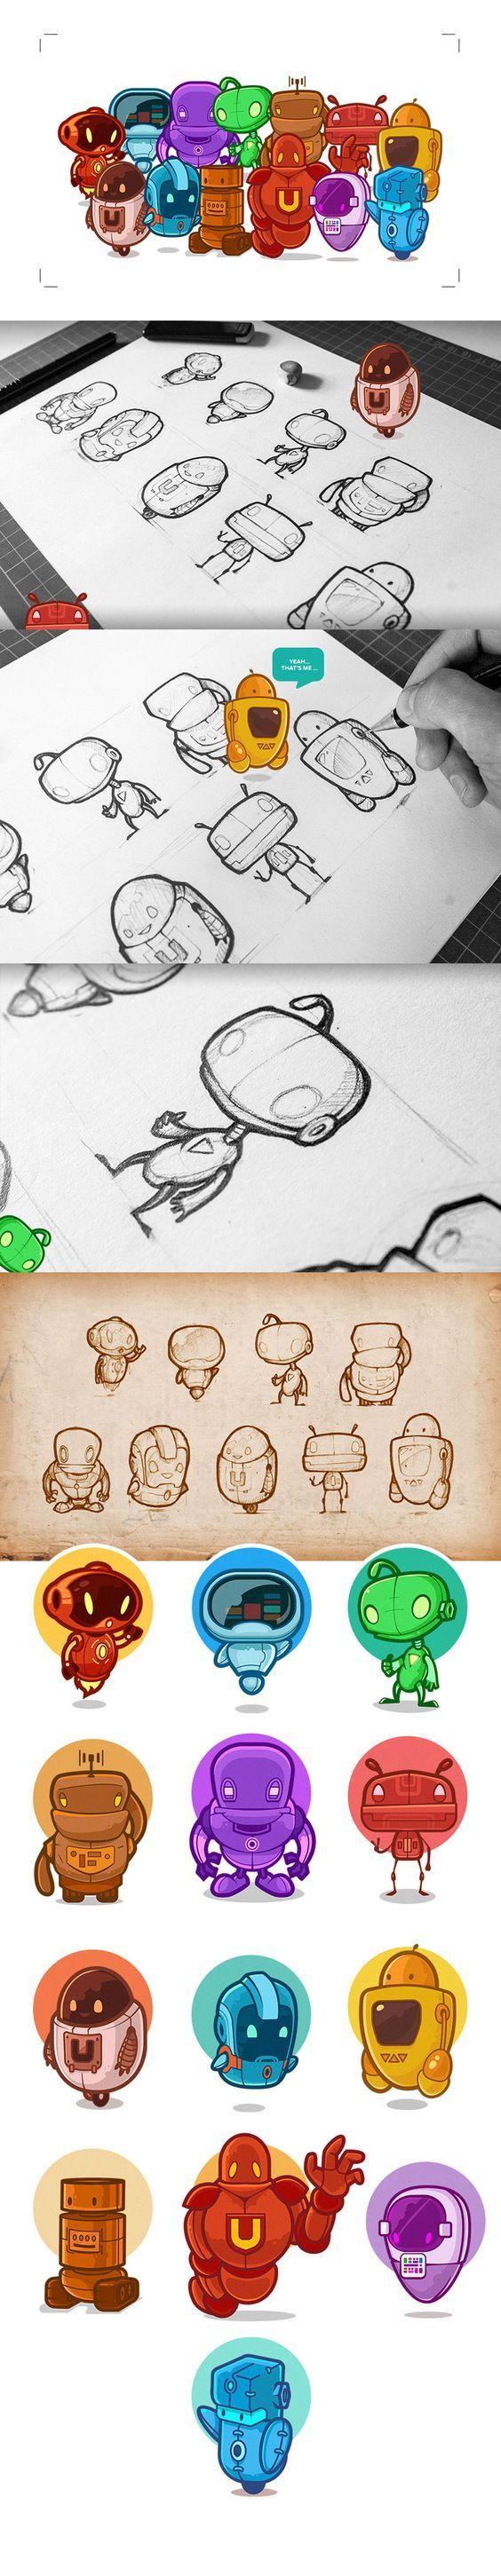 Illustration of Cute Little Robots by Tamas Moroz , designer and illustrator from Transylvania ( Cluj Napoca )// http://www.animhut.com/inspiration/cute-little-robots/: